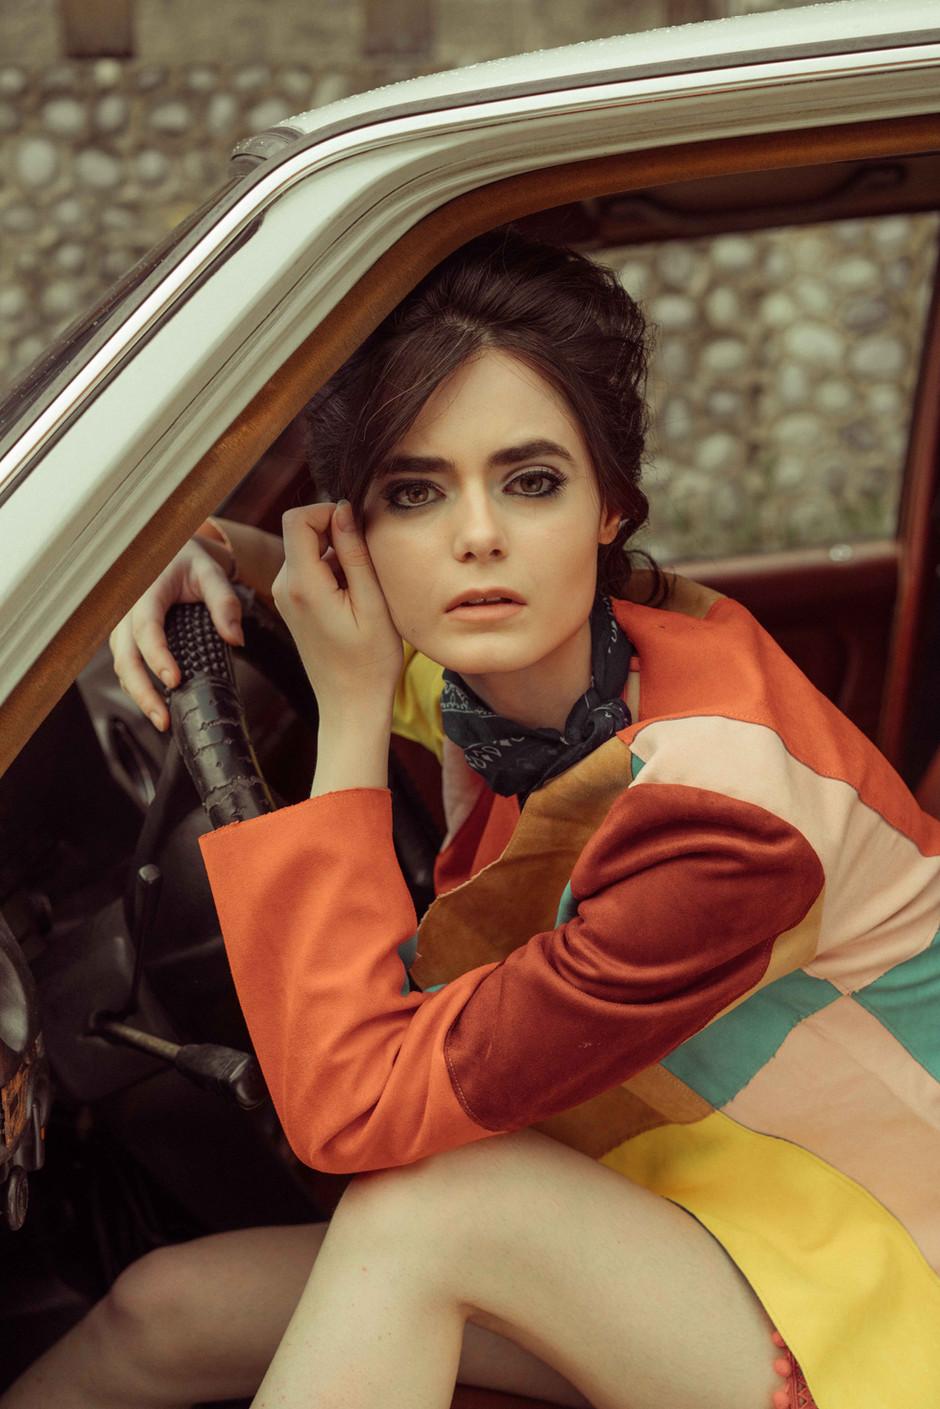 Photographer: Artu Nepomuceno Stylist: Meg Manzano Hairstylist: Carlo Umipig Model: Bronija Ales